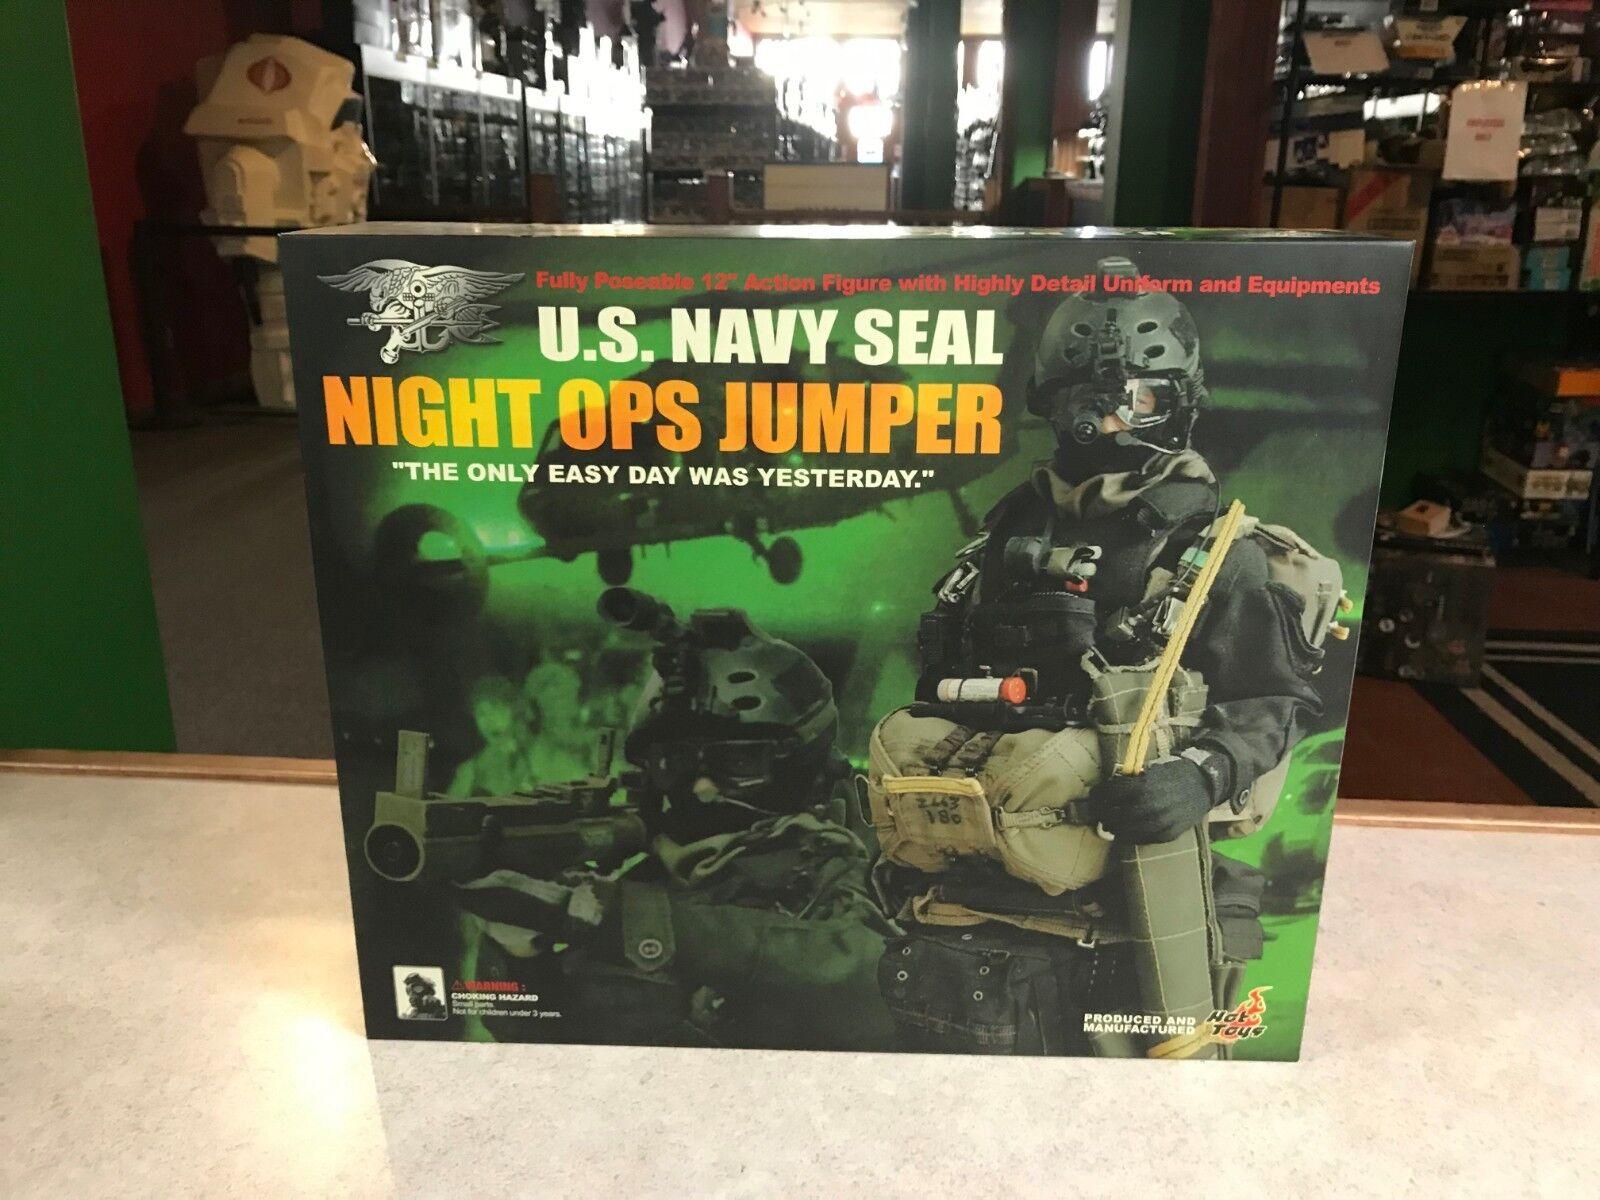 2003 Hot Toys 1/6 U.S Navy Seal NIGHT OPS JUMPER 12  Inch Figure NIB